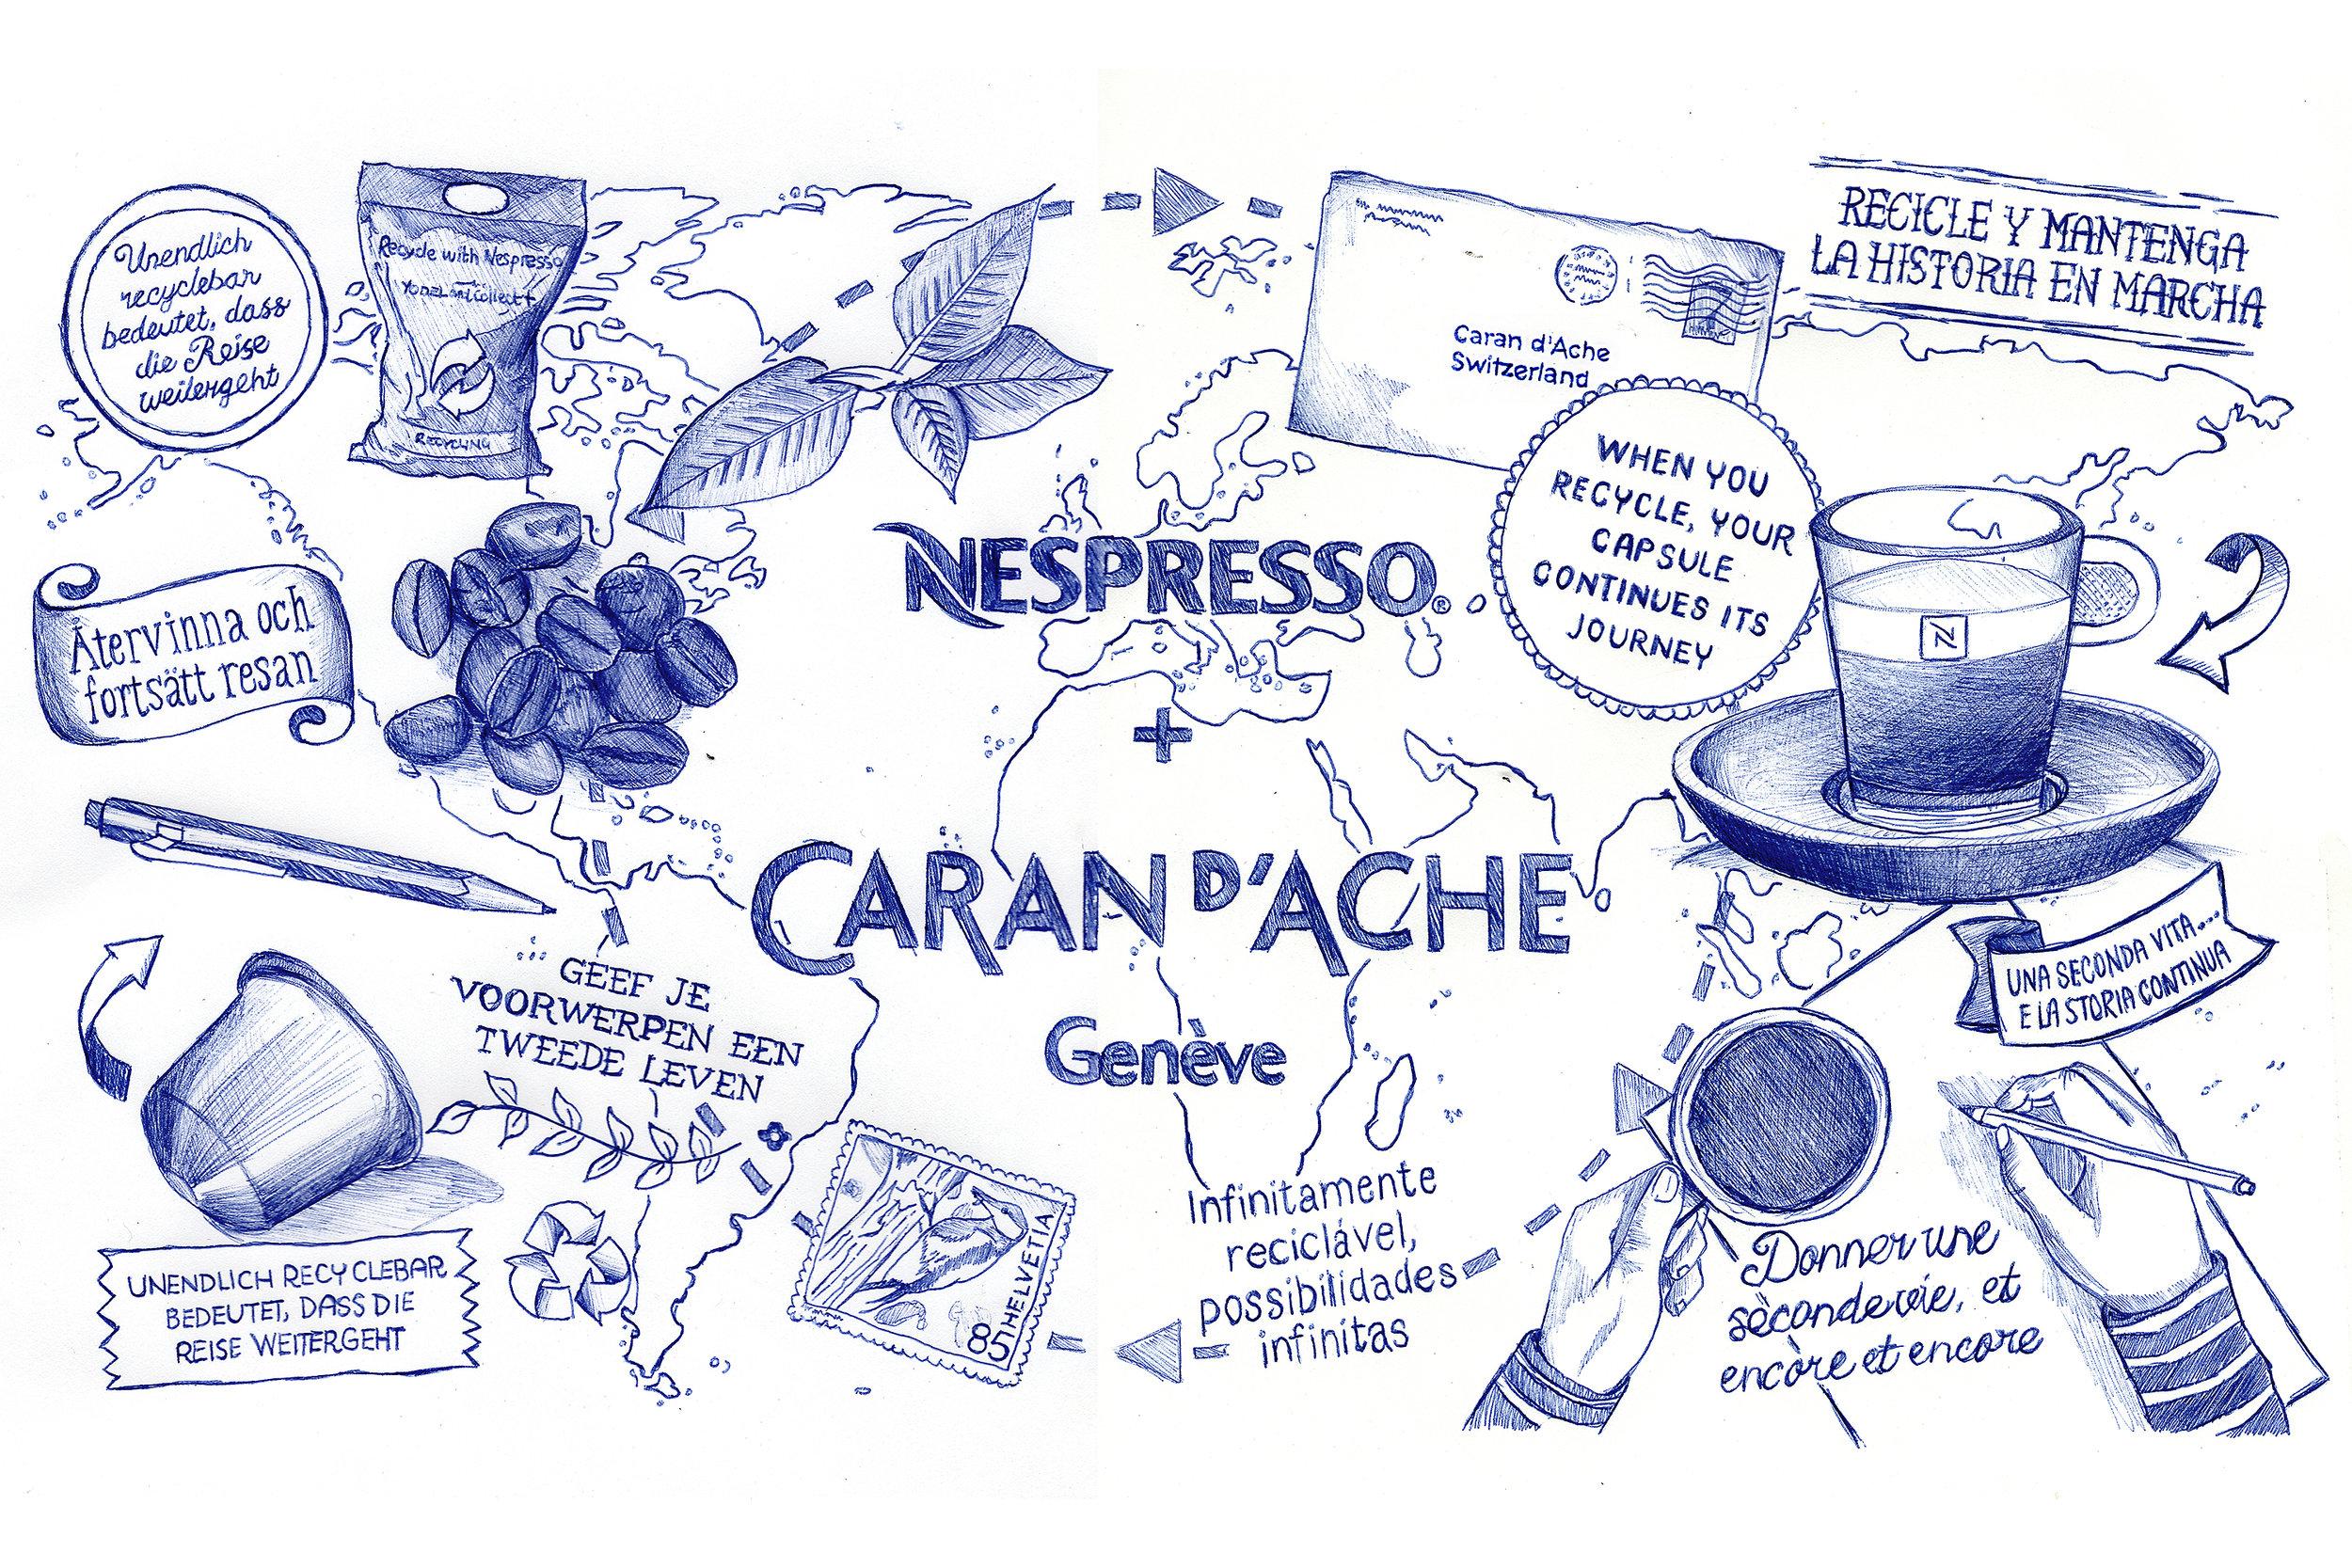 nespresso_carandache_sketch.jpg